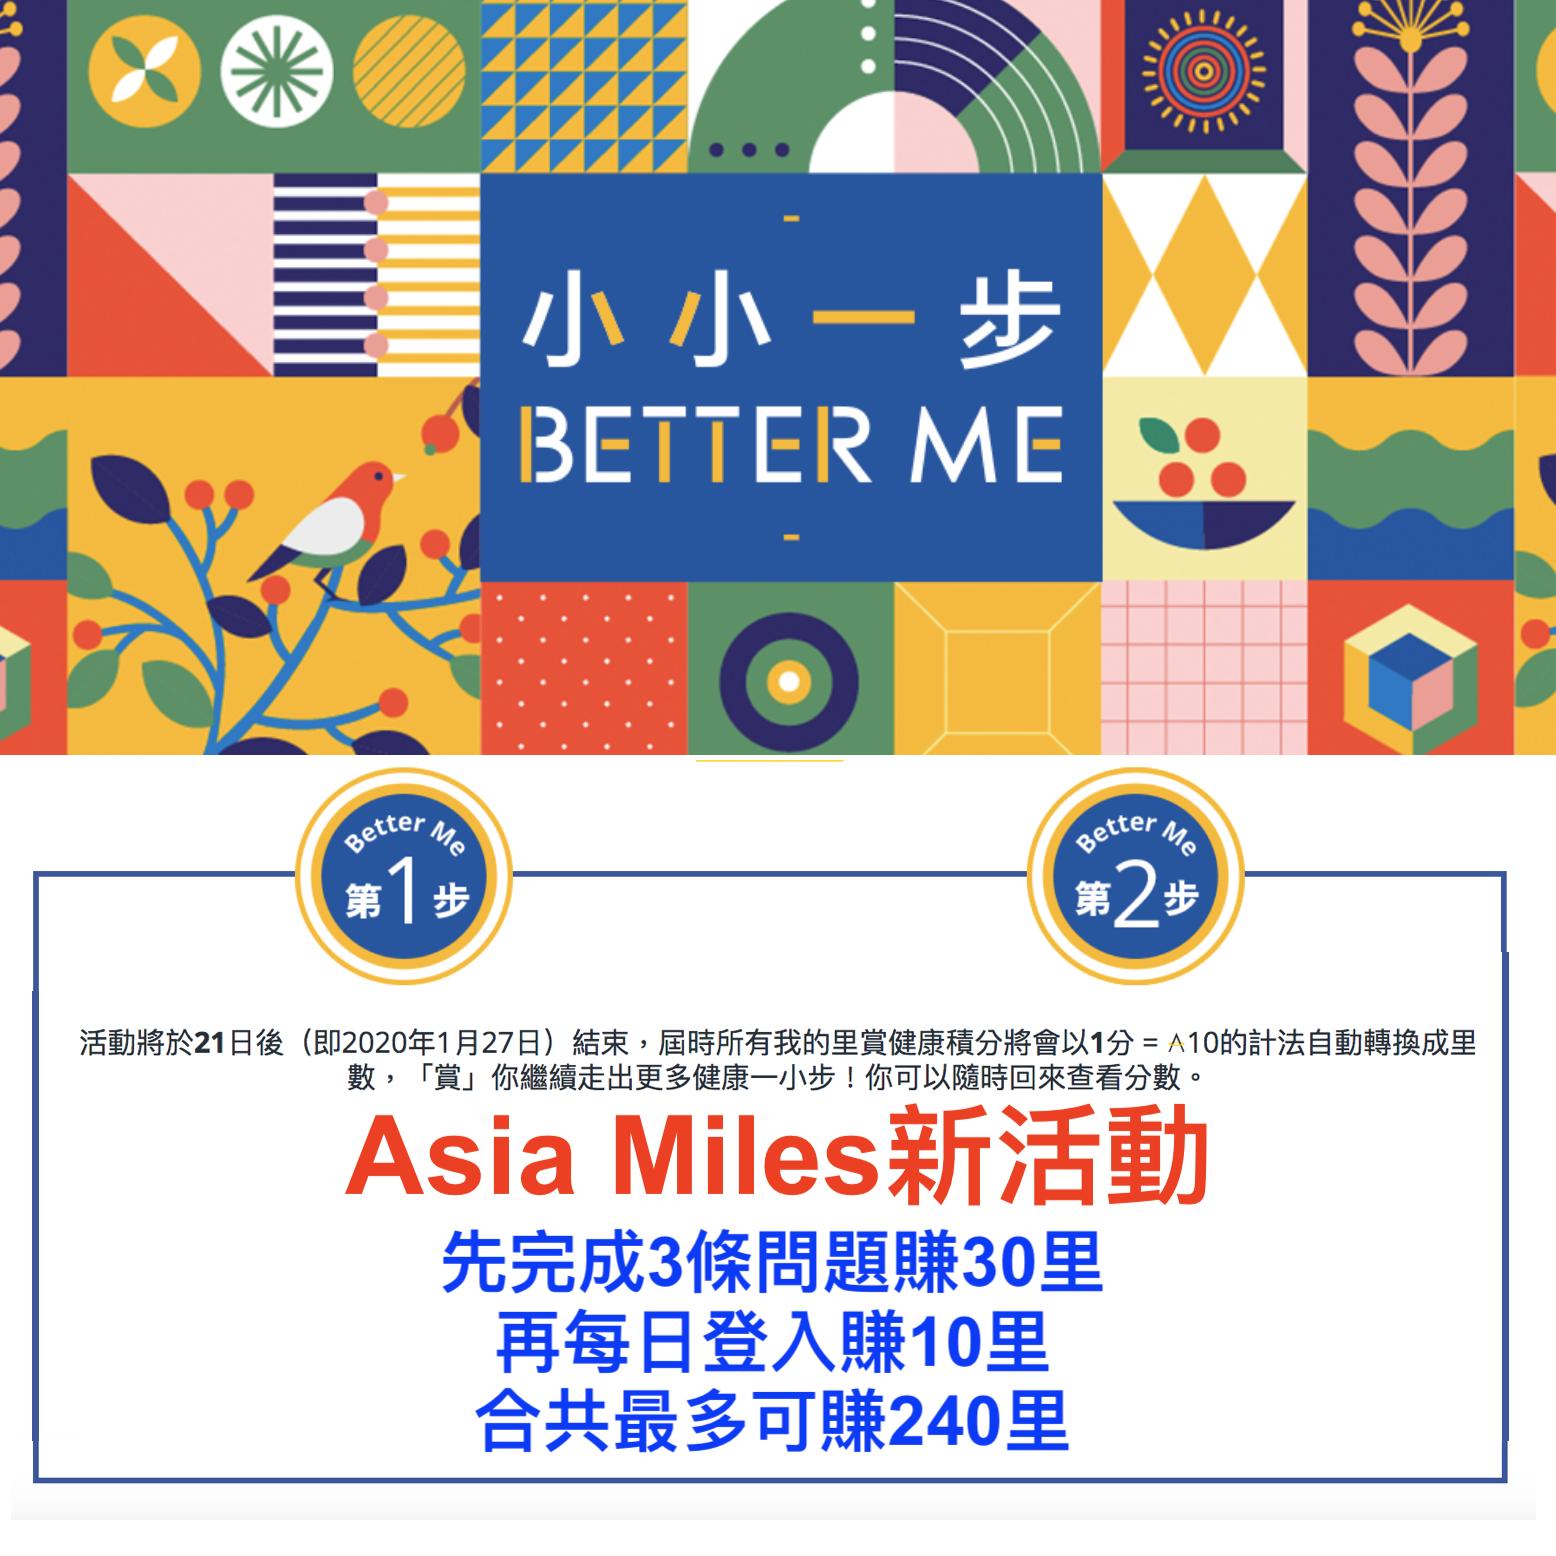 Asia Miles 小小一步 Better Me活動!先回答簡單3條問題再每日登入可得240里!